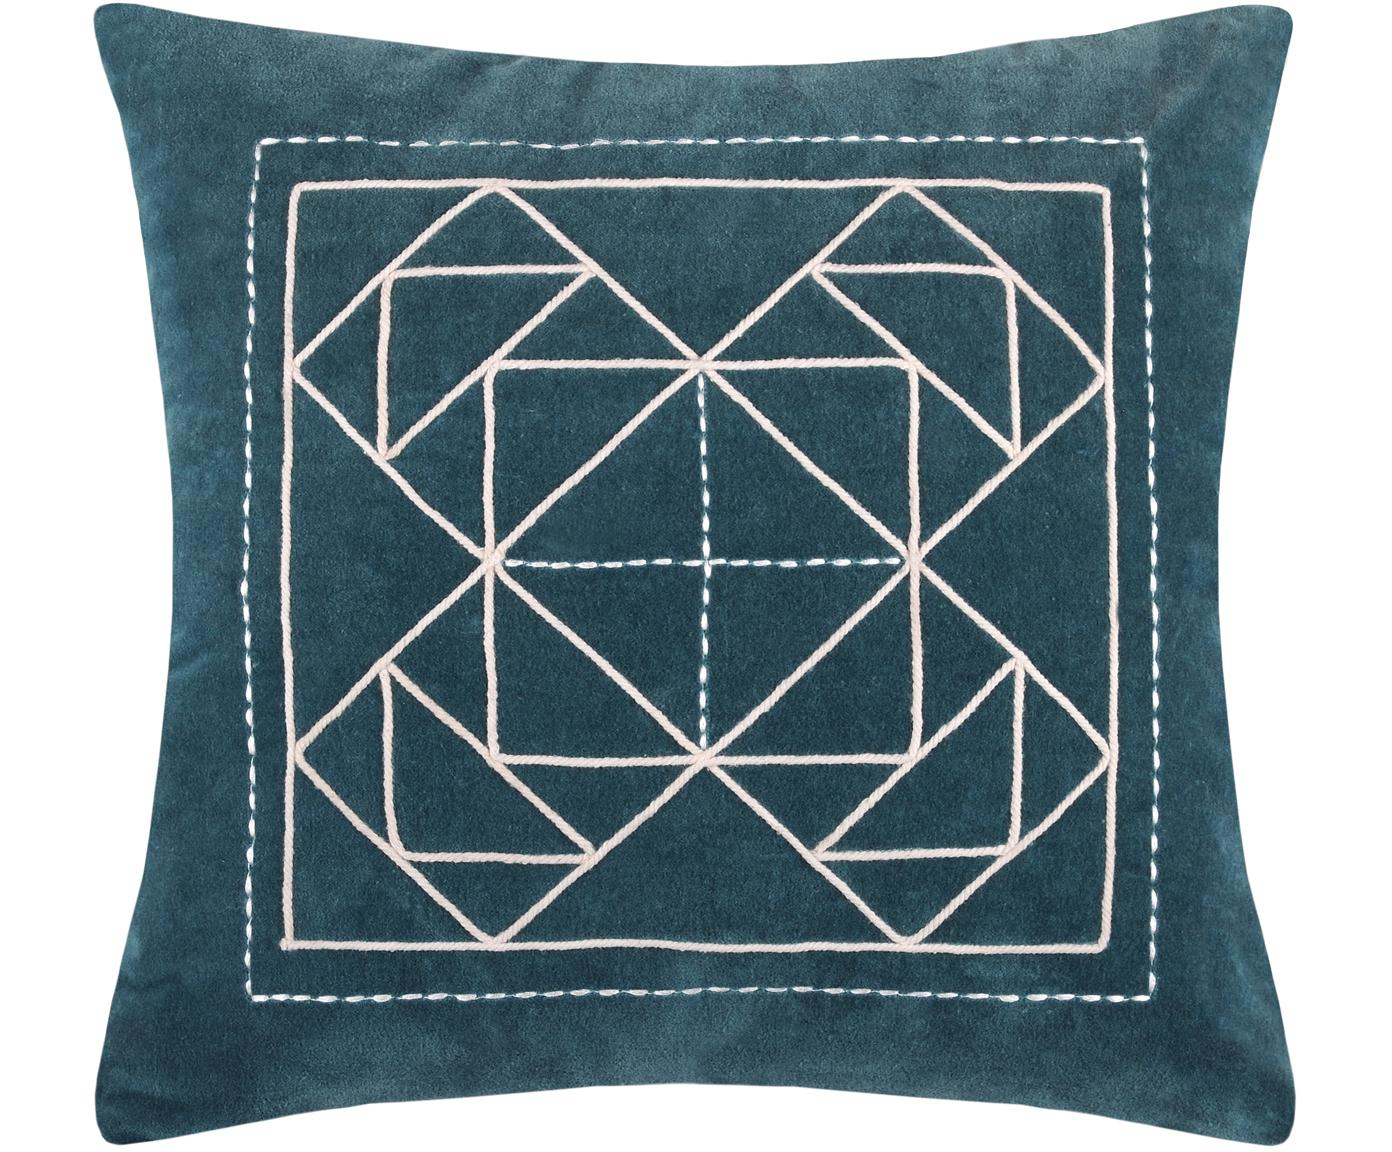 Cojín Niro, con relleno, Funda: 100%algodón, Azul petróleo, blanco, An 40 x L 40 cm